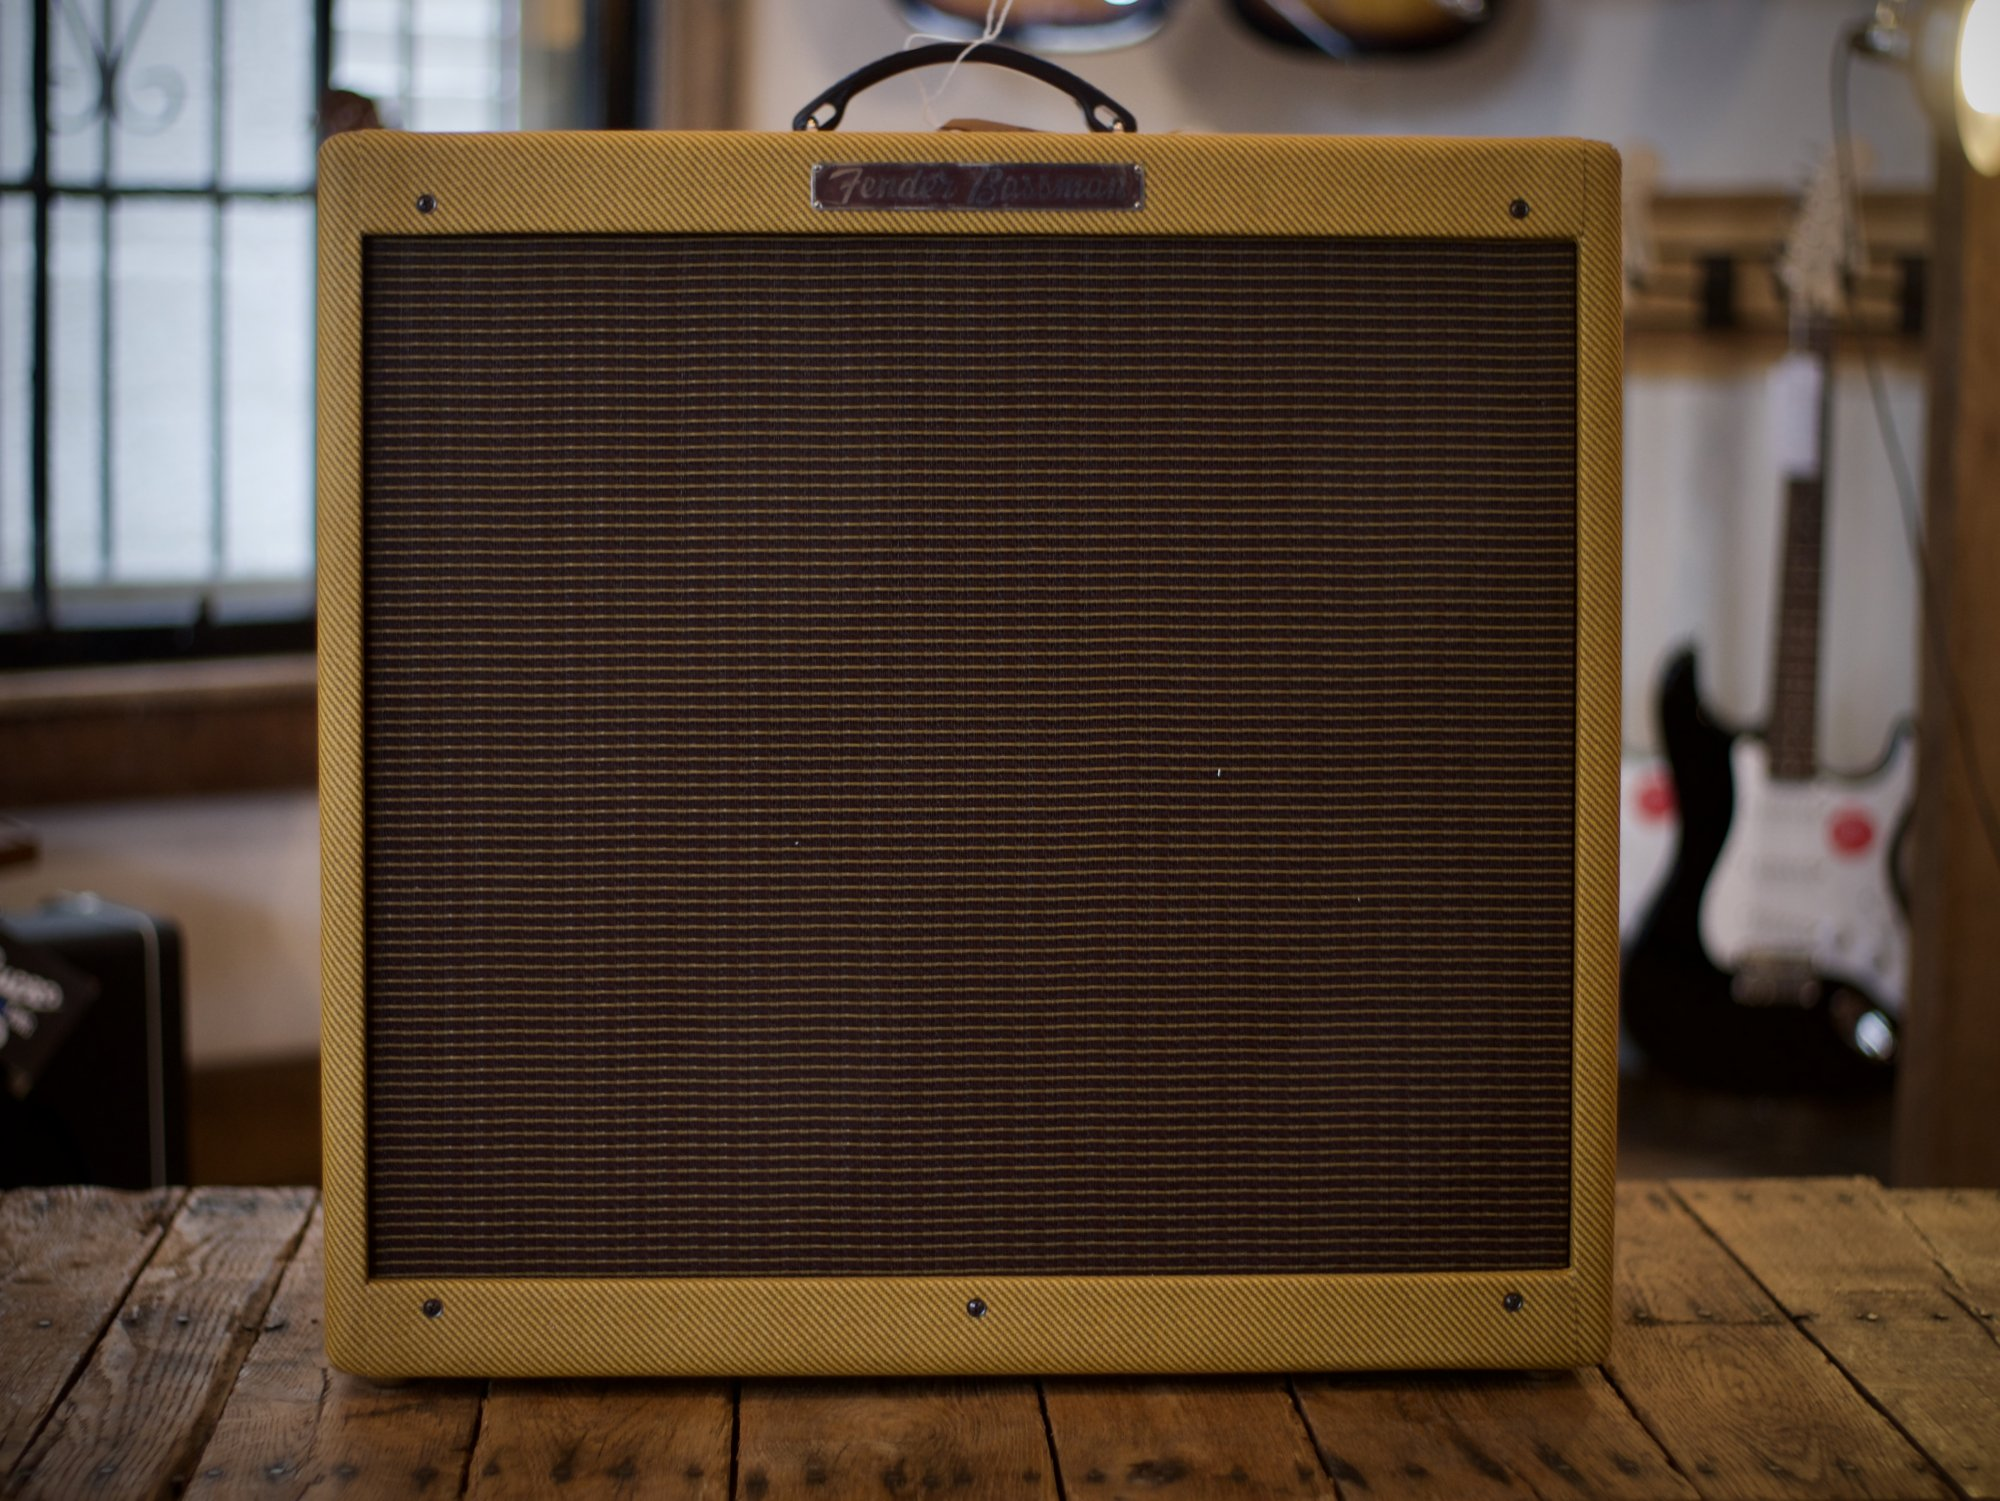 Fender  '59 BASSMAN LTD Amp